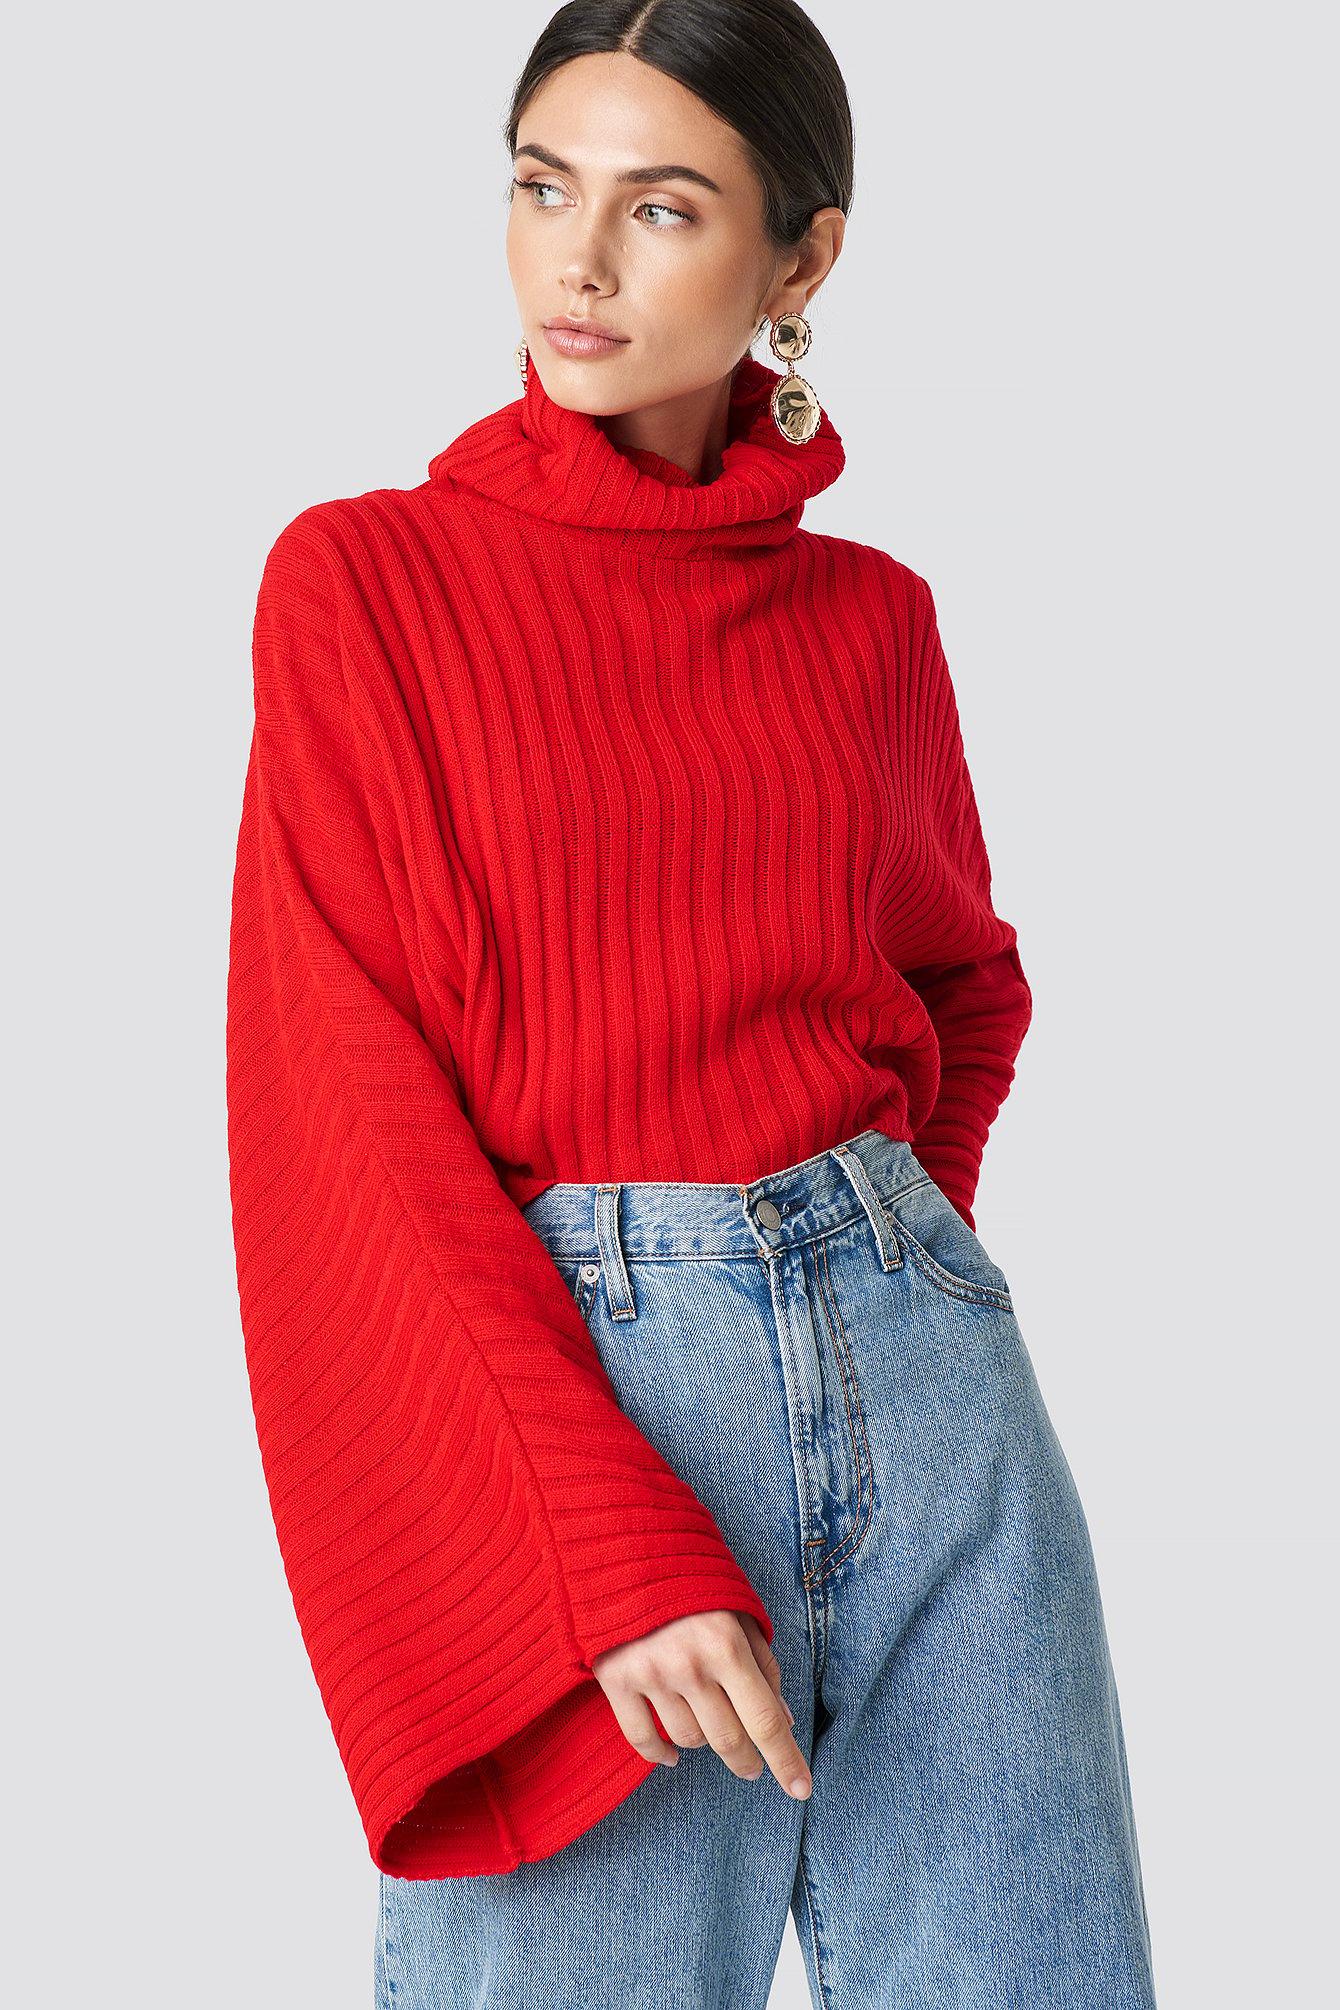 Round Neck Heavy Knit Sweater Beige   na-kd.com